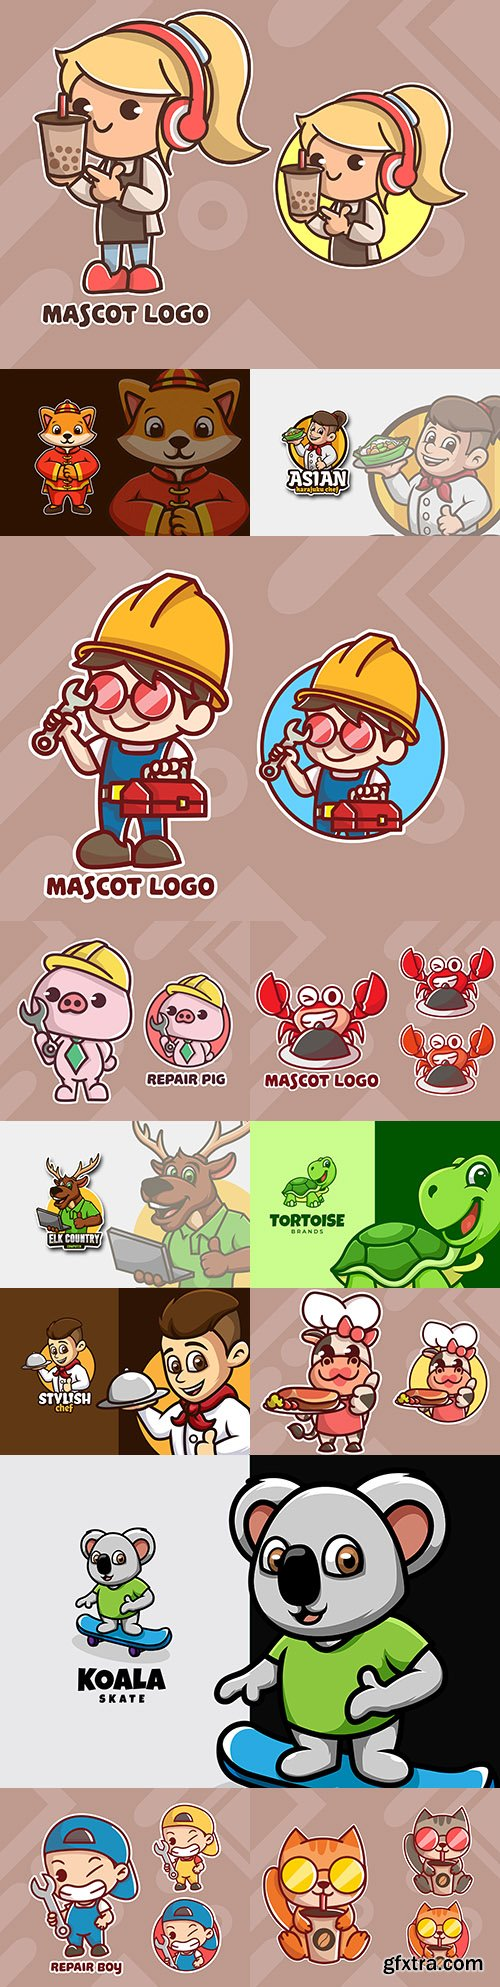 Emblem mascot and Brand name logos design 20